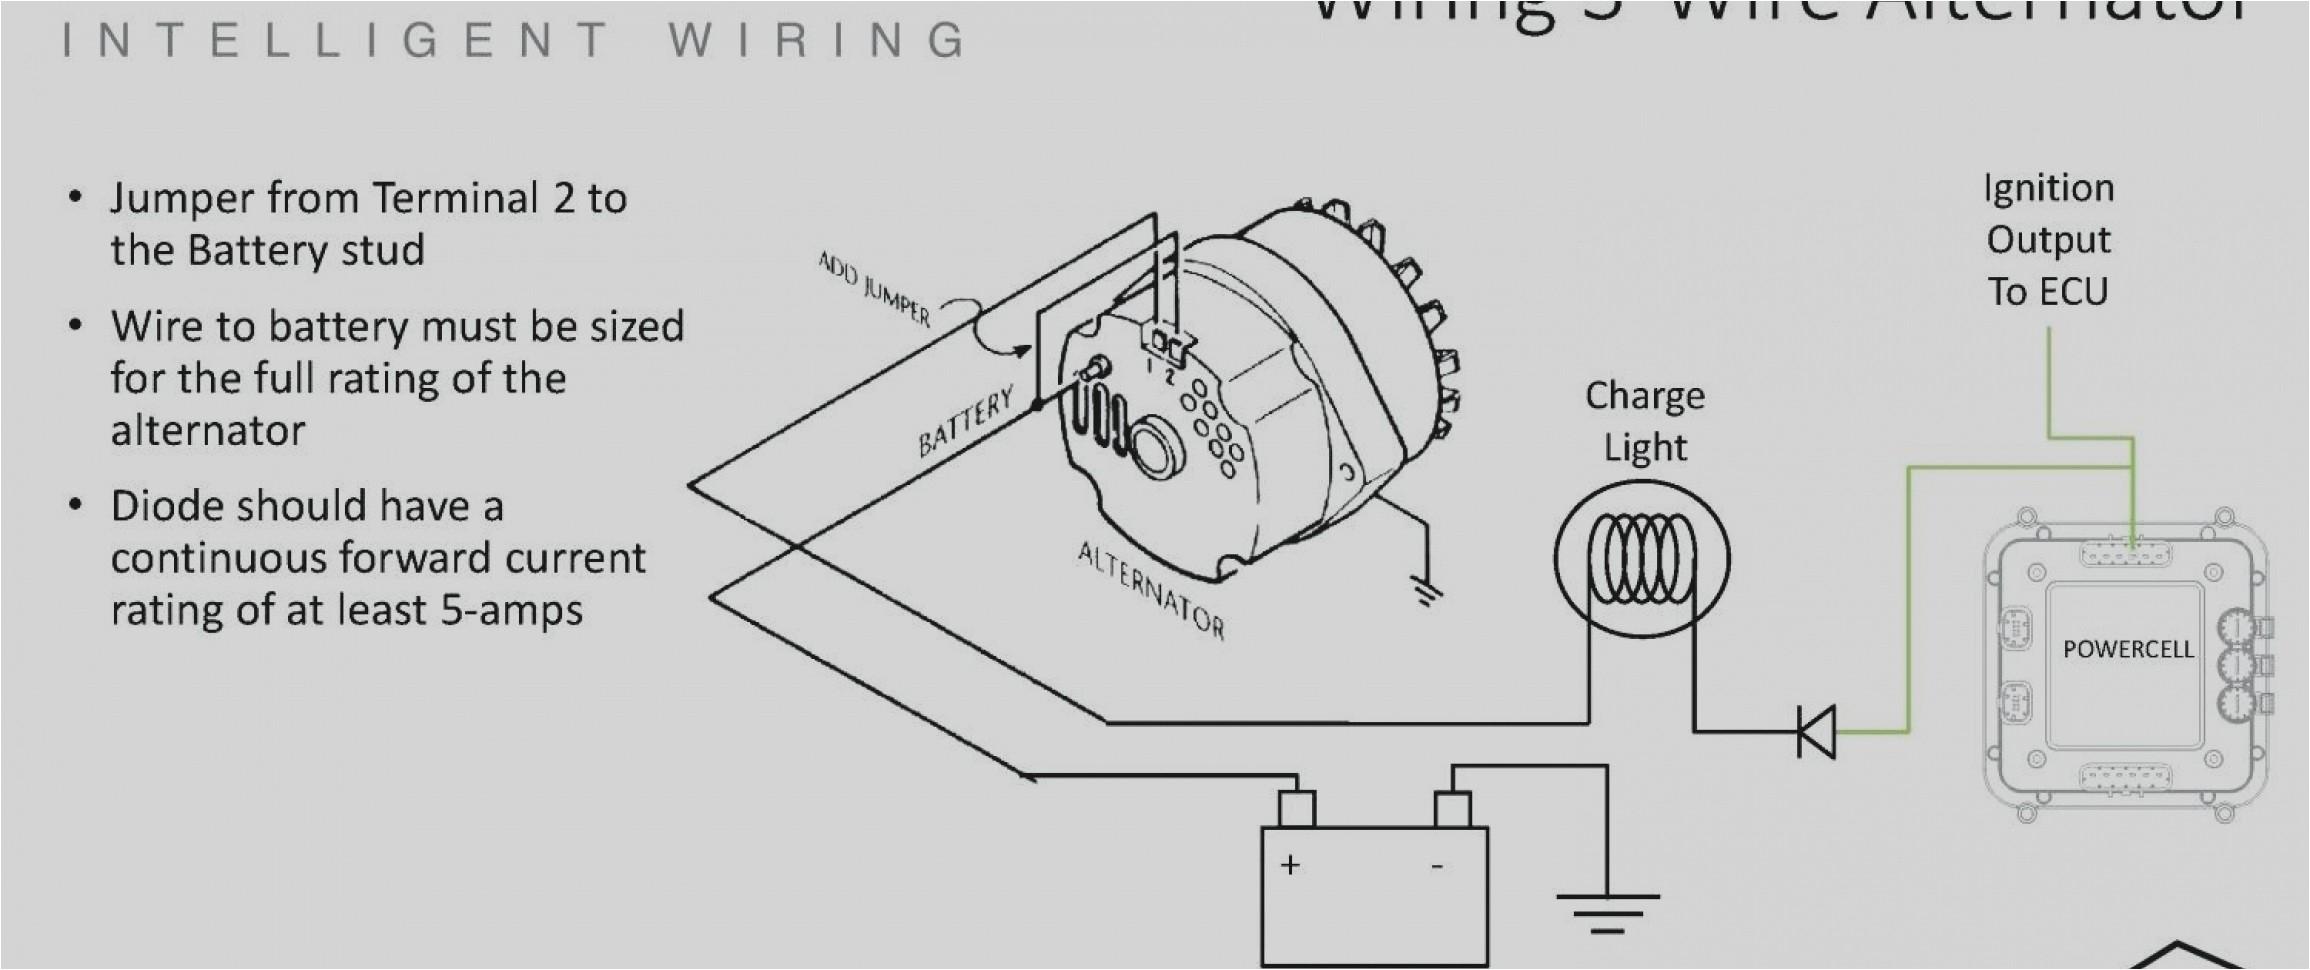 mack 3 wire alternator diagram wiring diagram expert mack alternator wiring